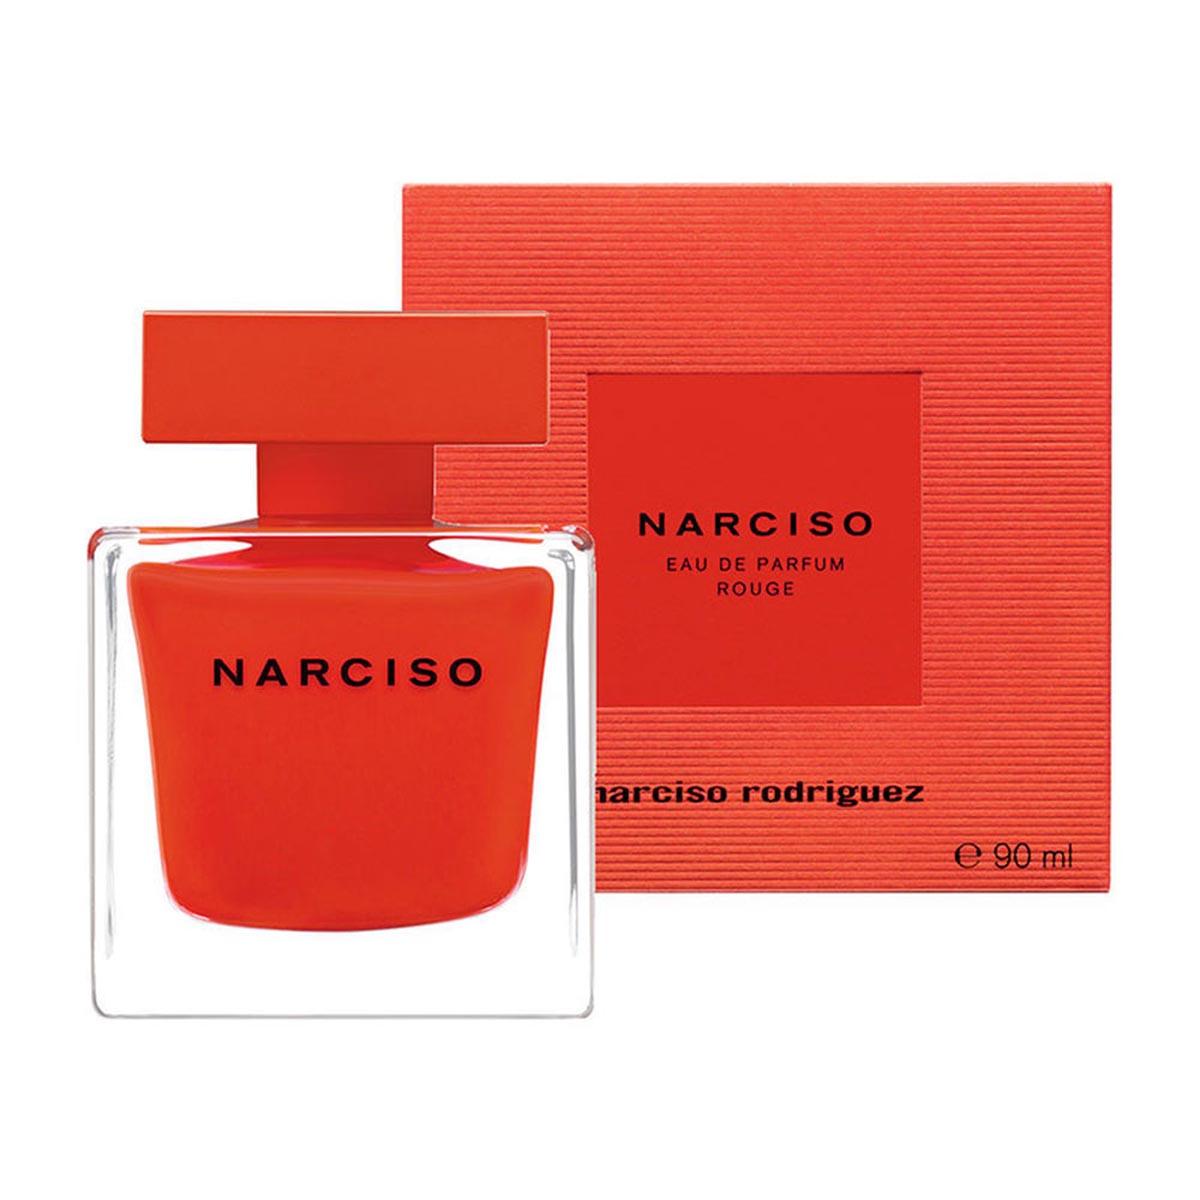 Narciso rodriguez narciso eau de parfum rouge 90ml vaporizador